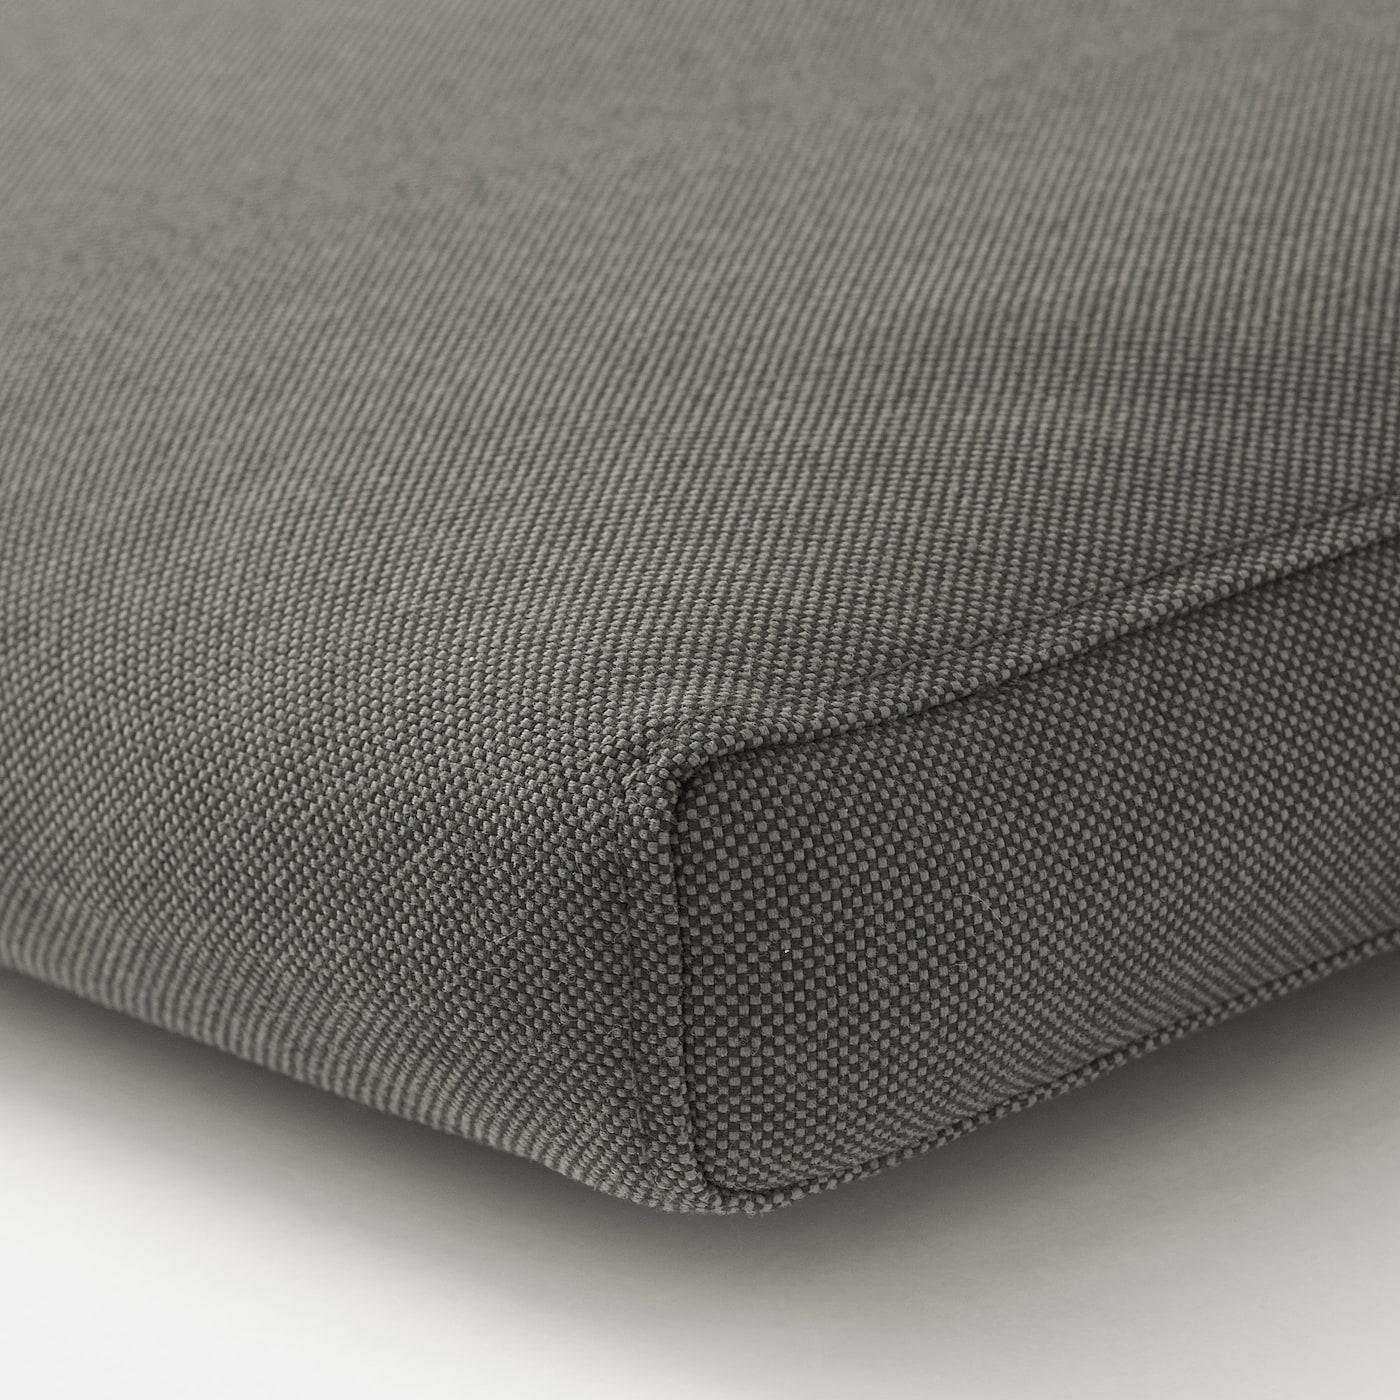 FRÖSÖN/DUVHOLMEN Chair cushion, outdoor, dark grey, 50x50 cm